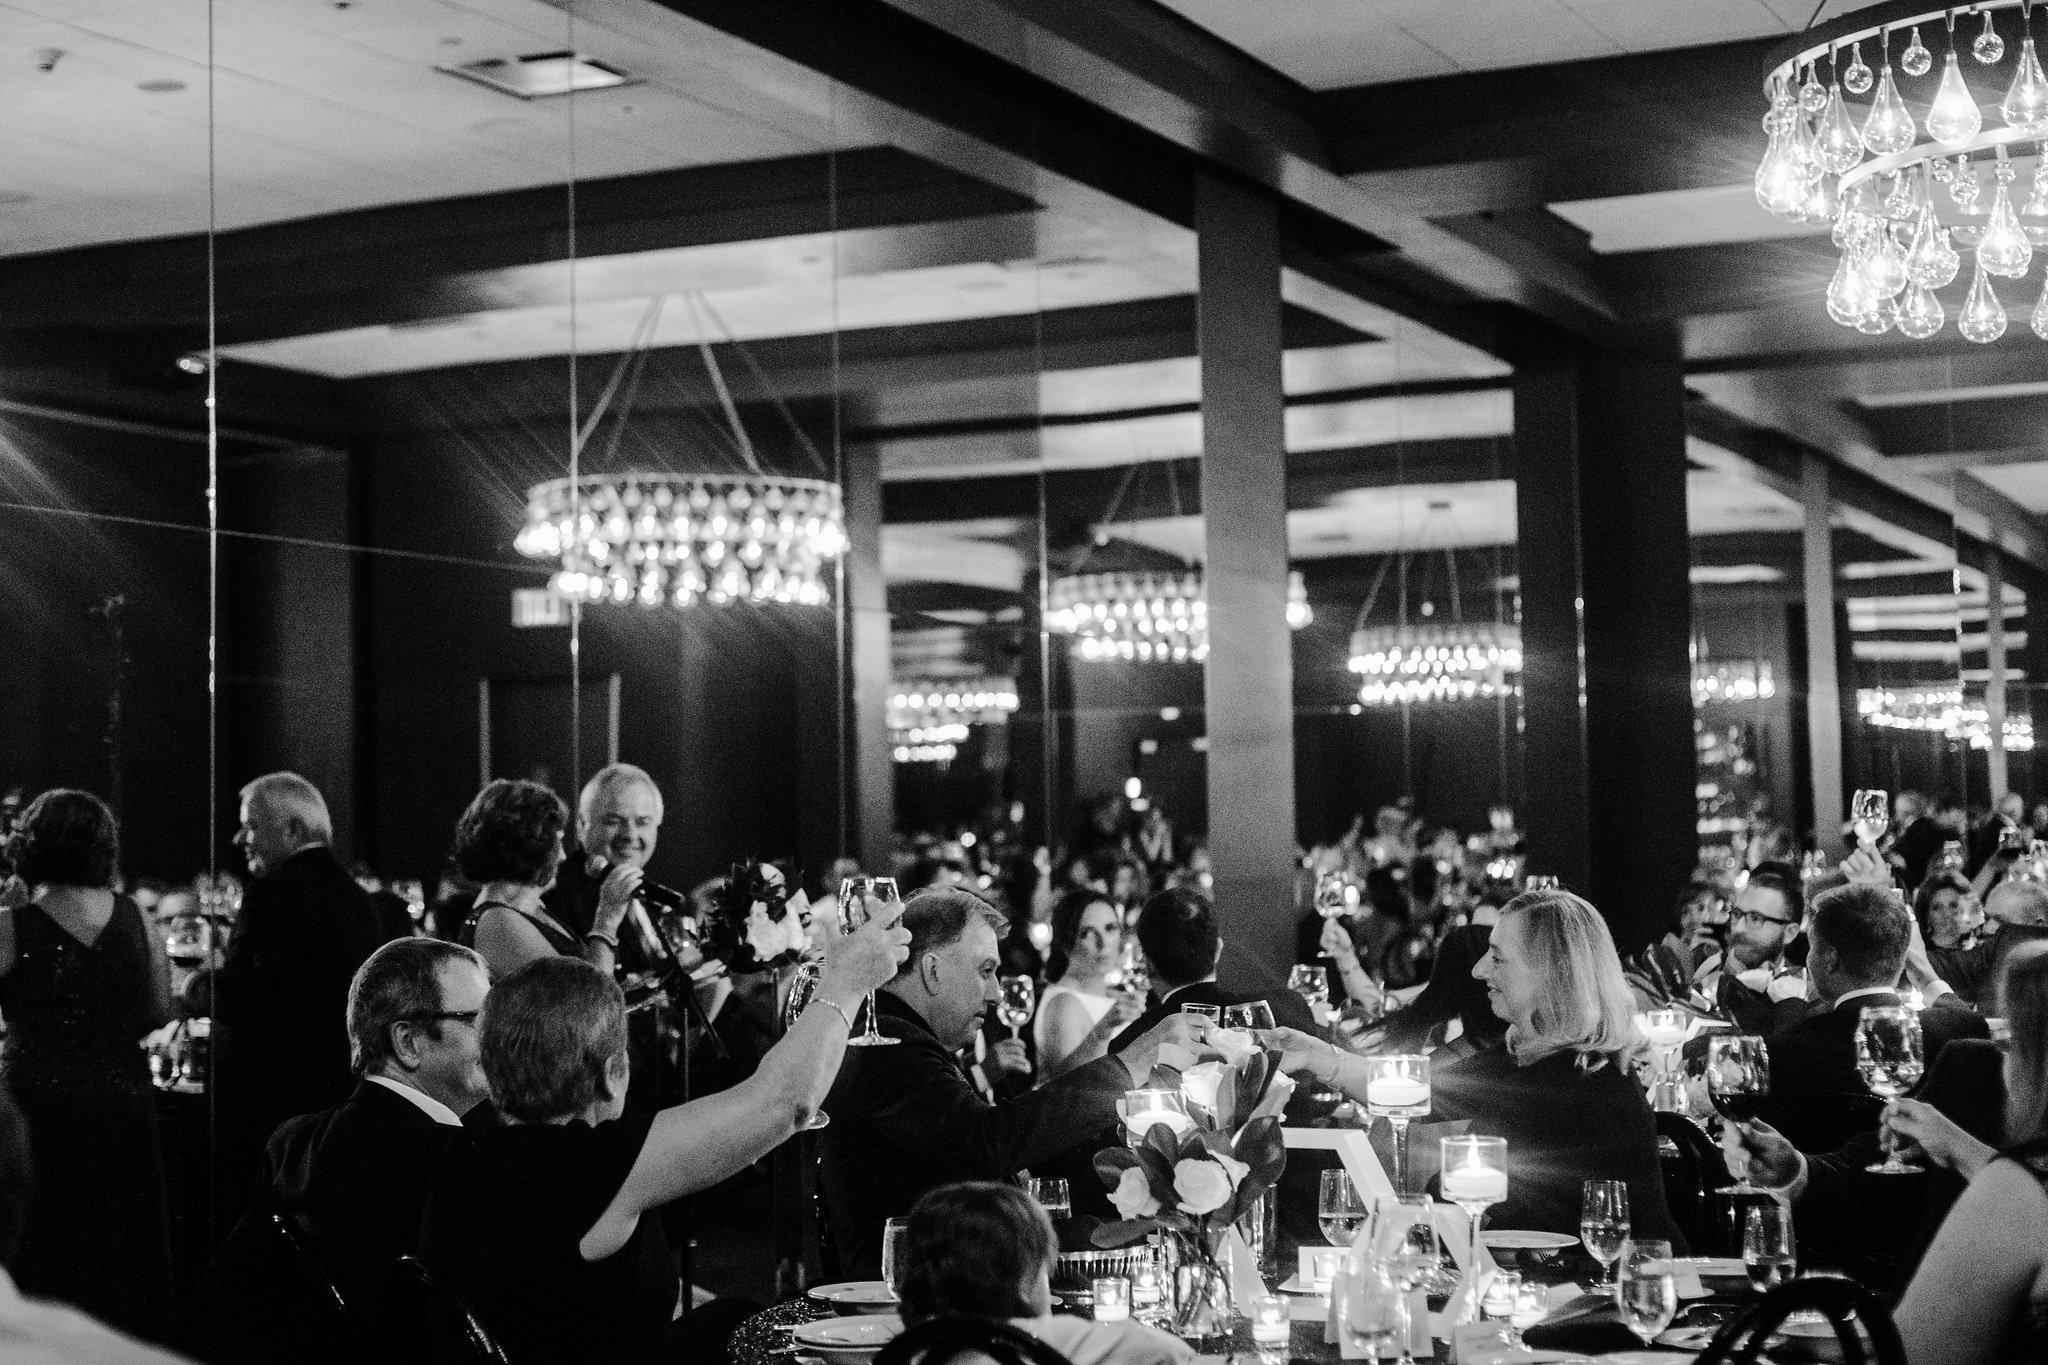 thompsonrooftopweddingphotos 10 - Thompson Hotel Wedding Photos